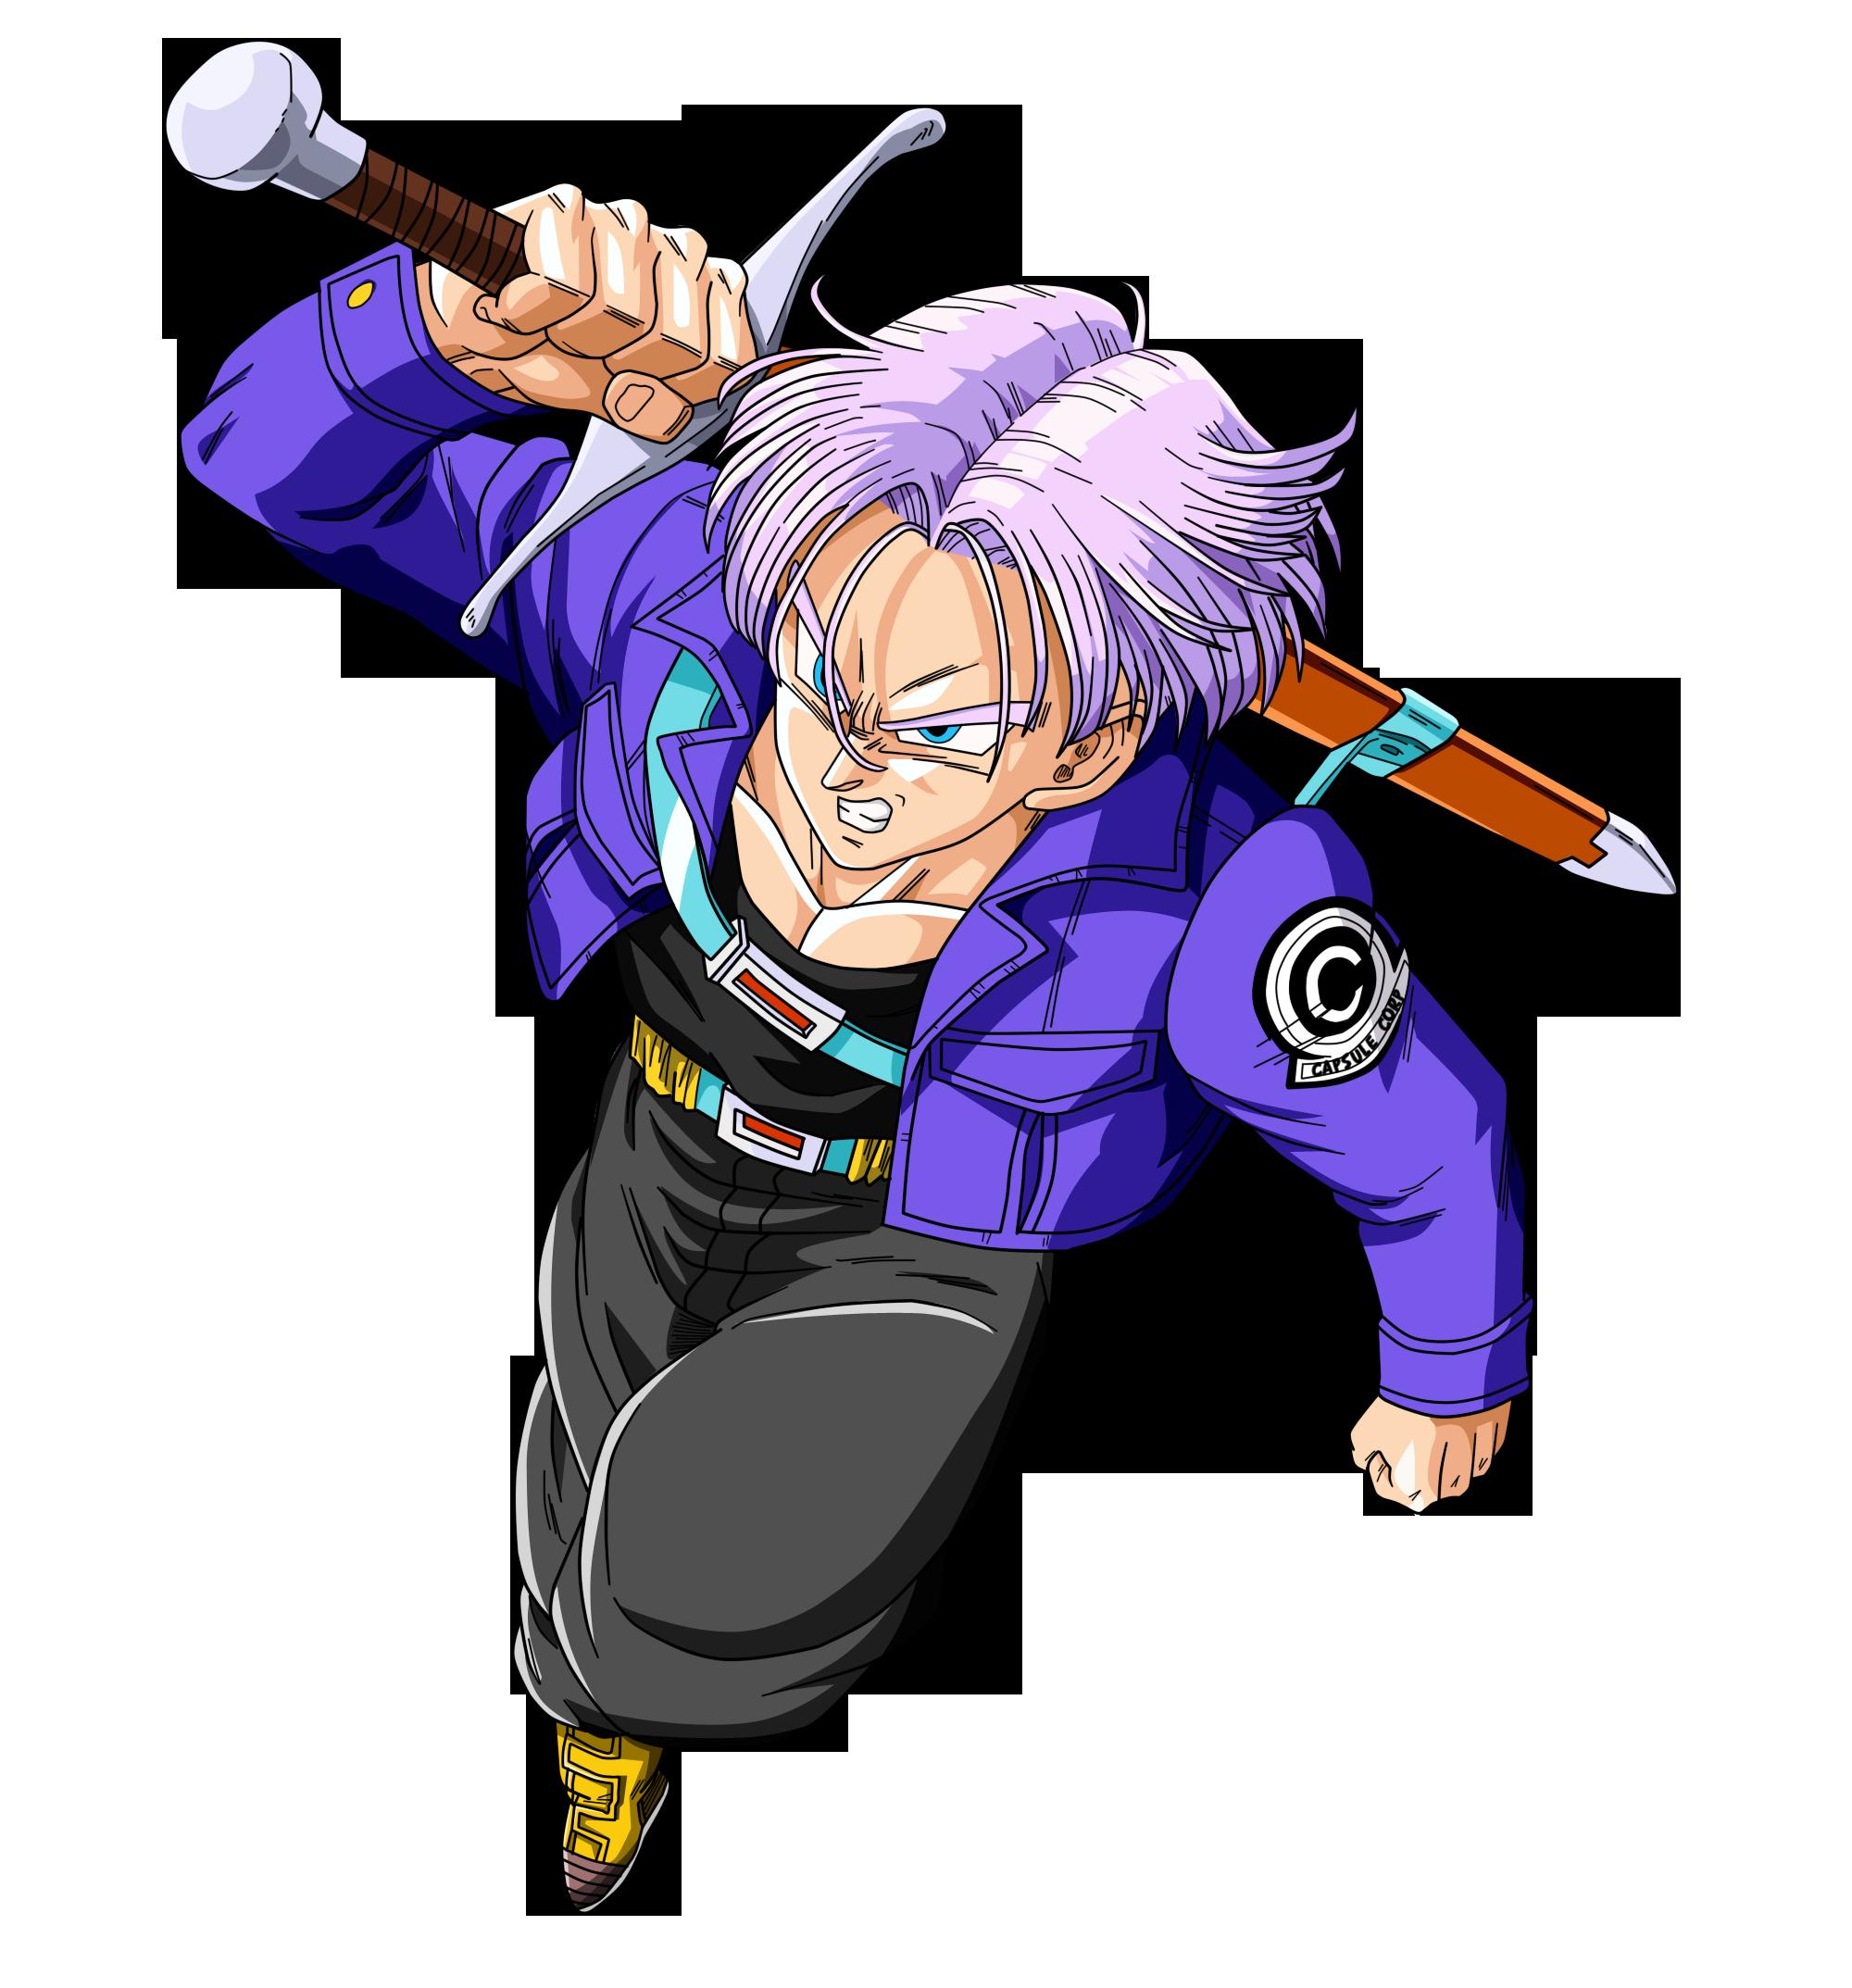 Trunks del Futuro(Kai) - Dragon Ball Fanon Wiki